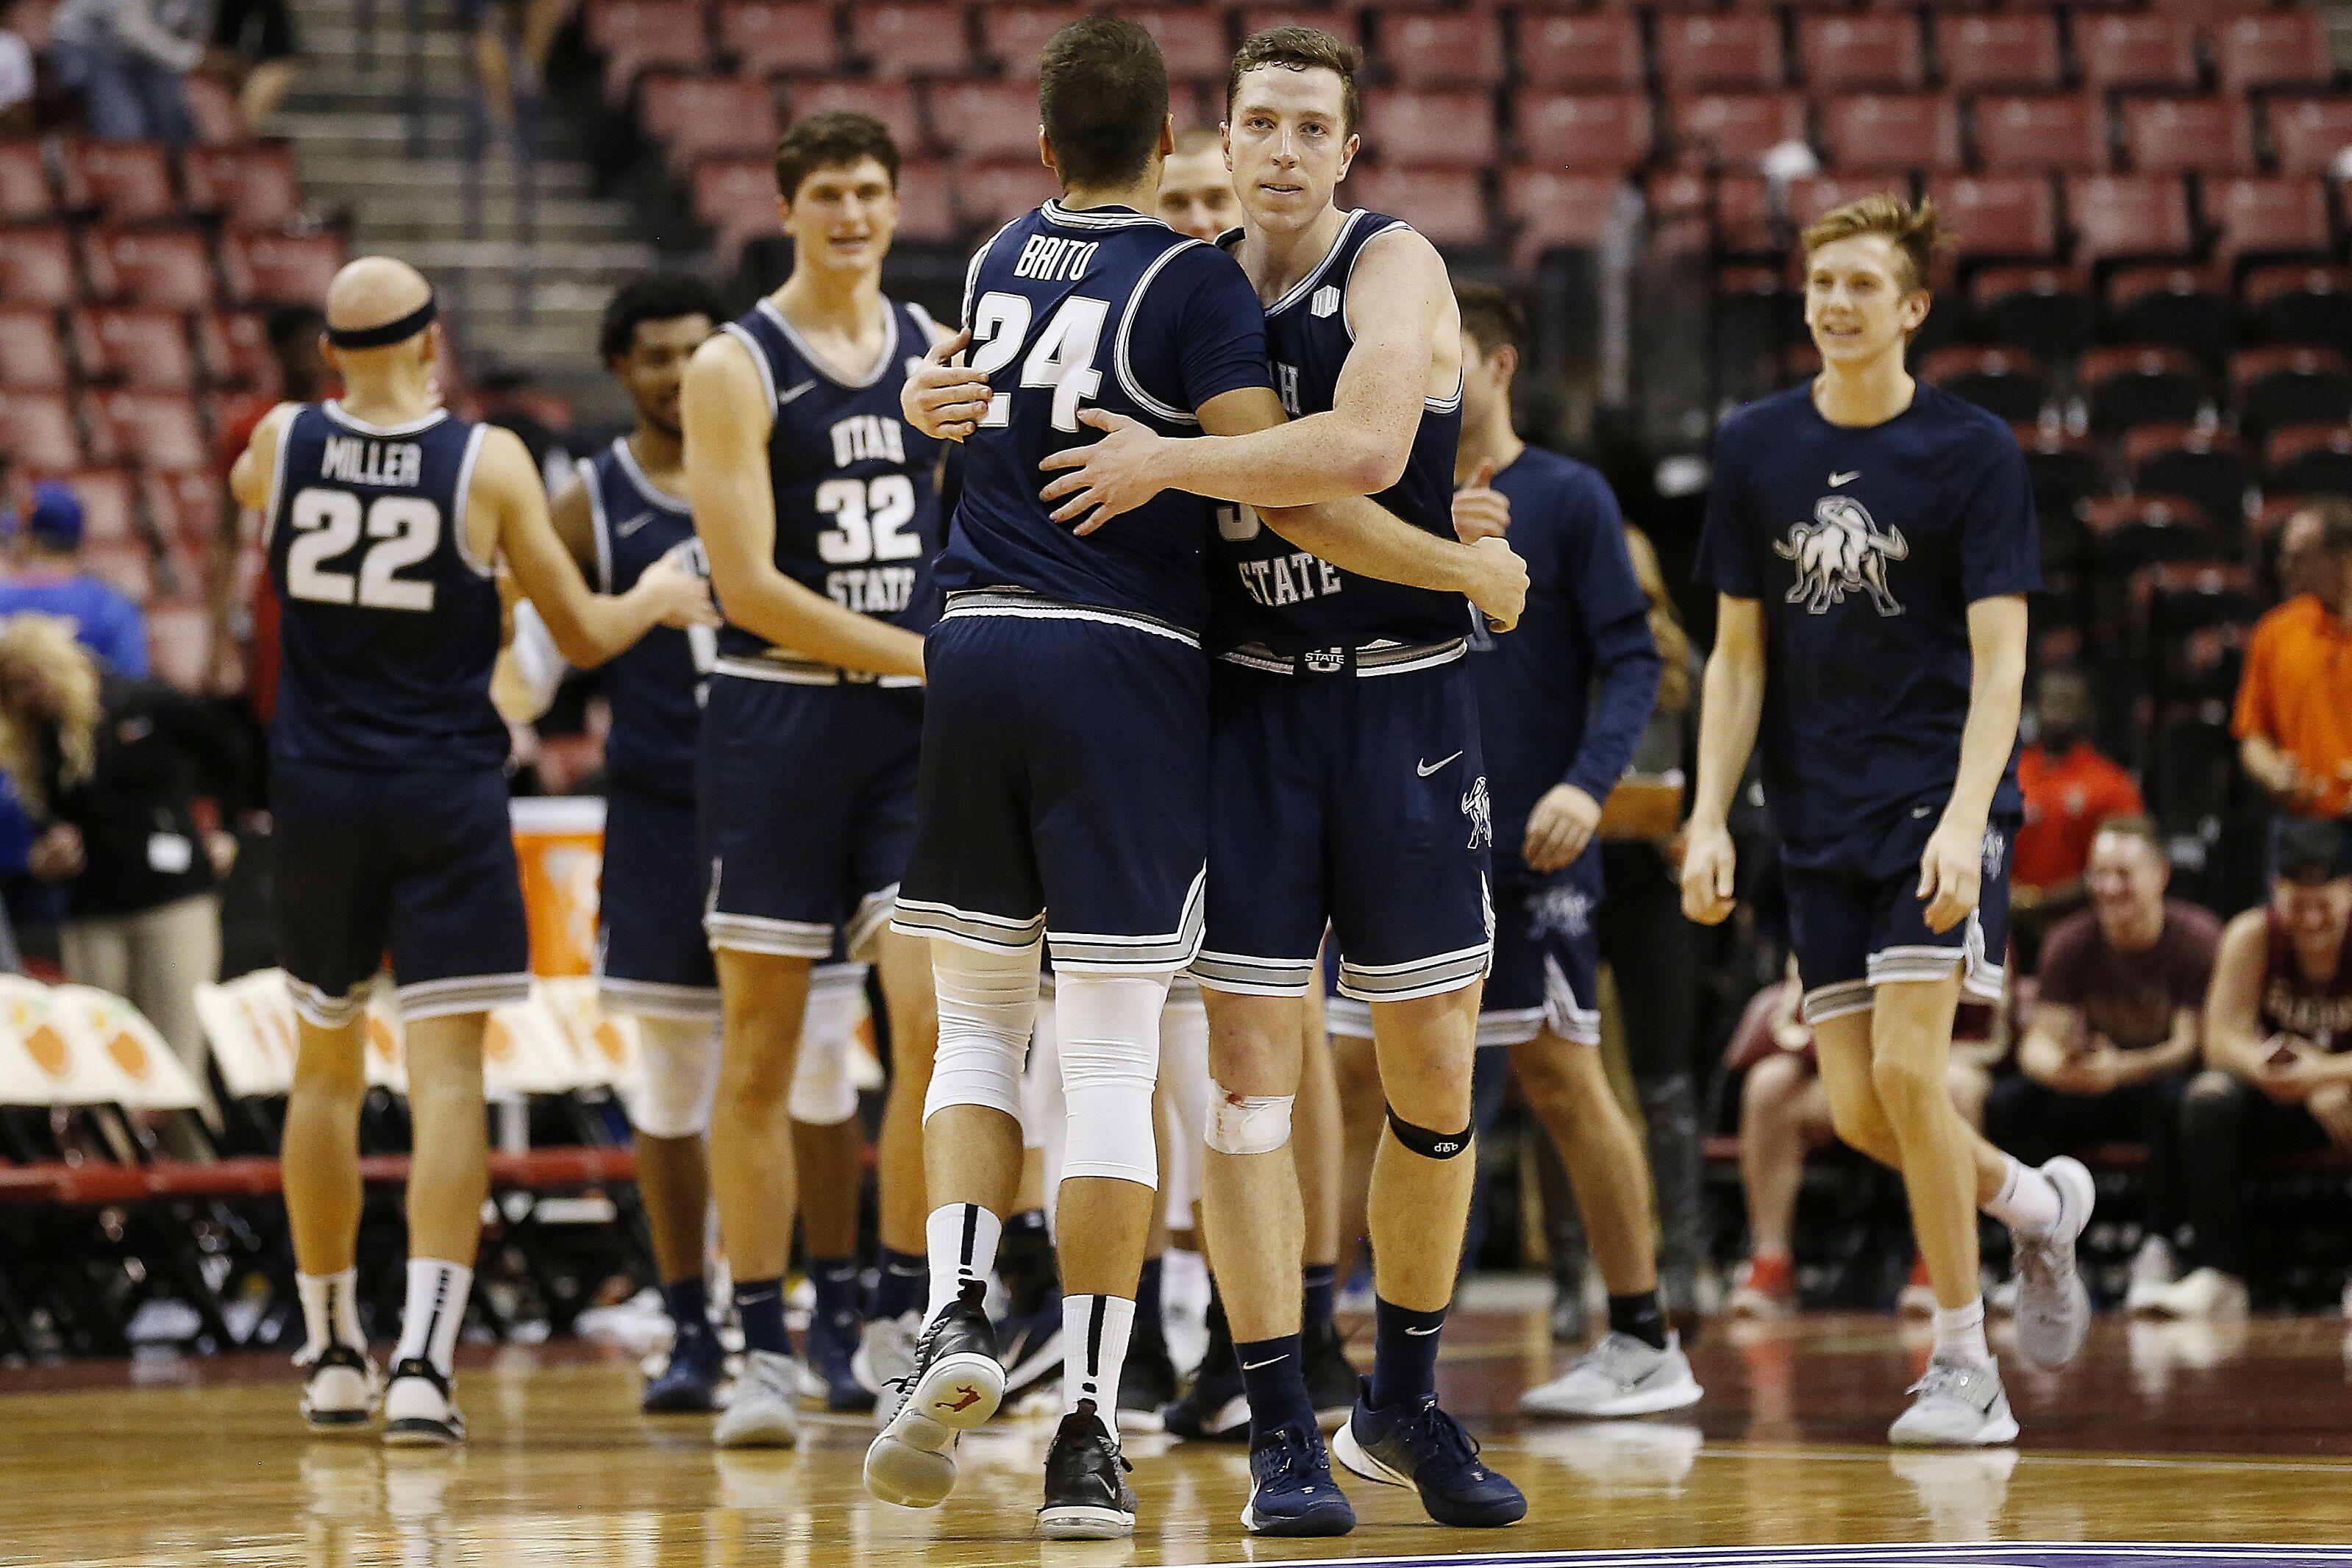 Bracketology 2020: Duke/Syracuse, Saint Mary's/BYU among week's best matchups